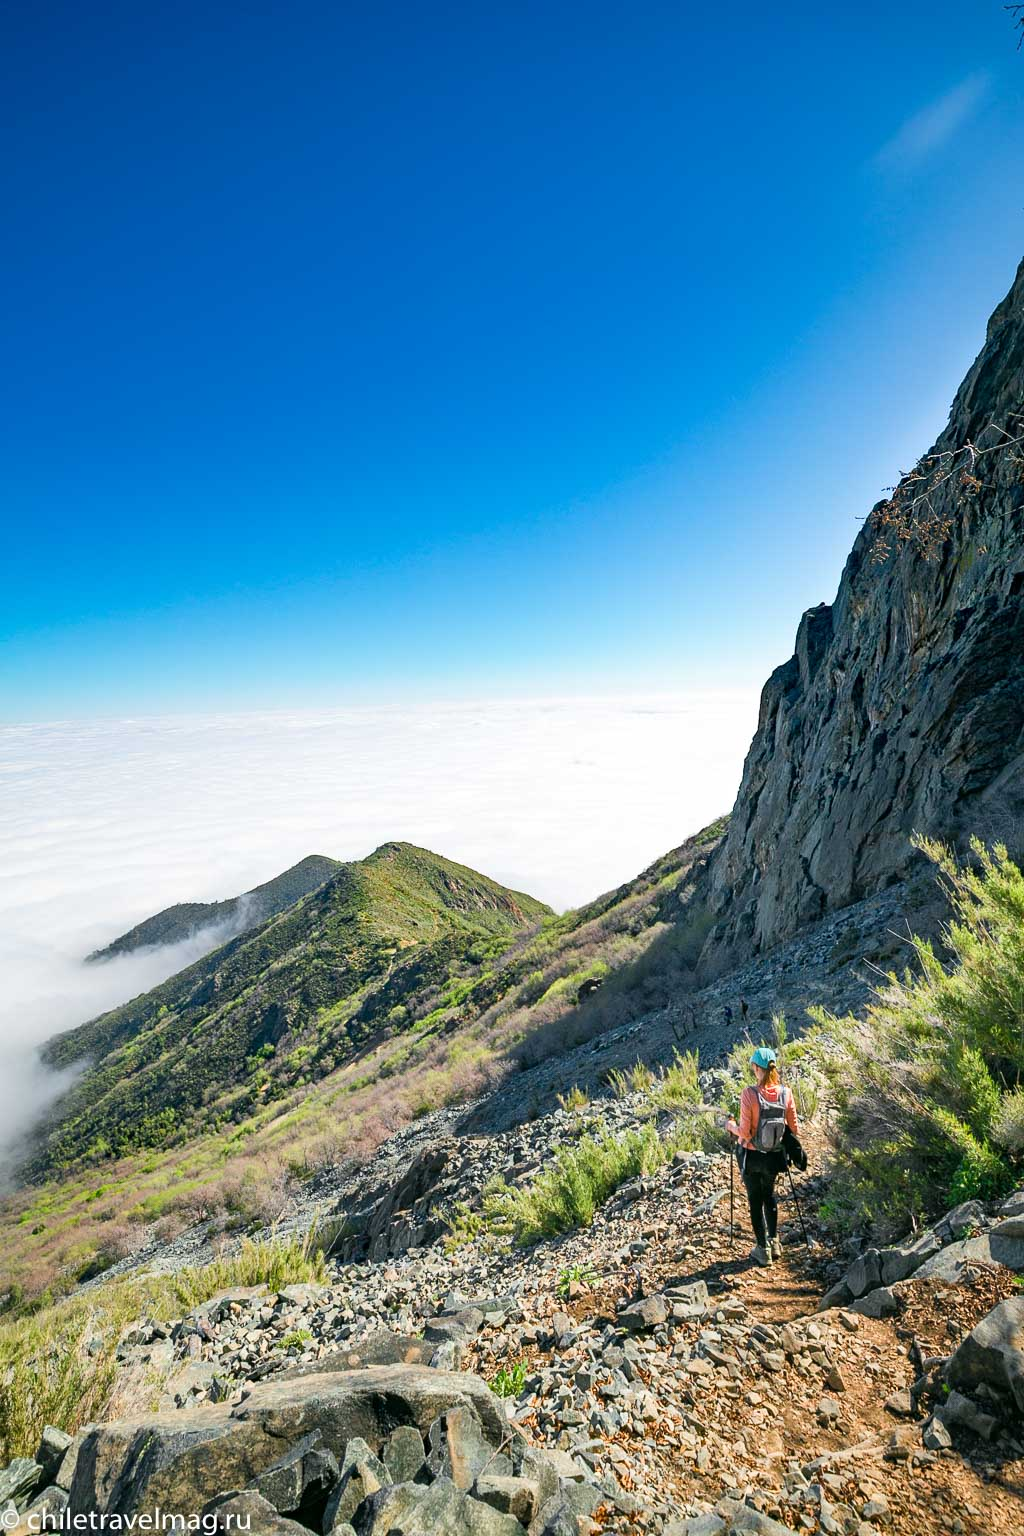 Парк Ла Кампана треккинг горы Чили18